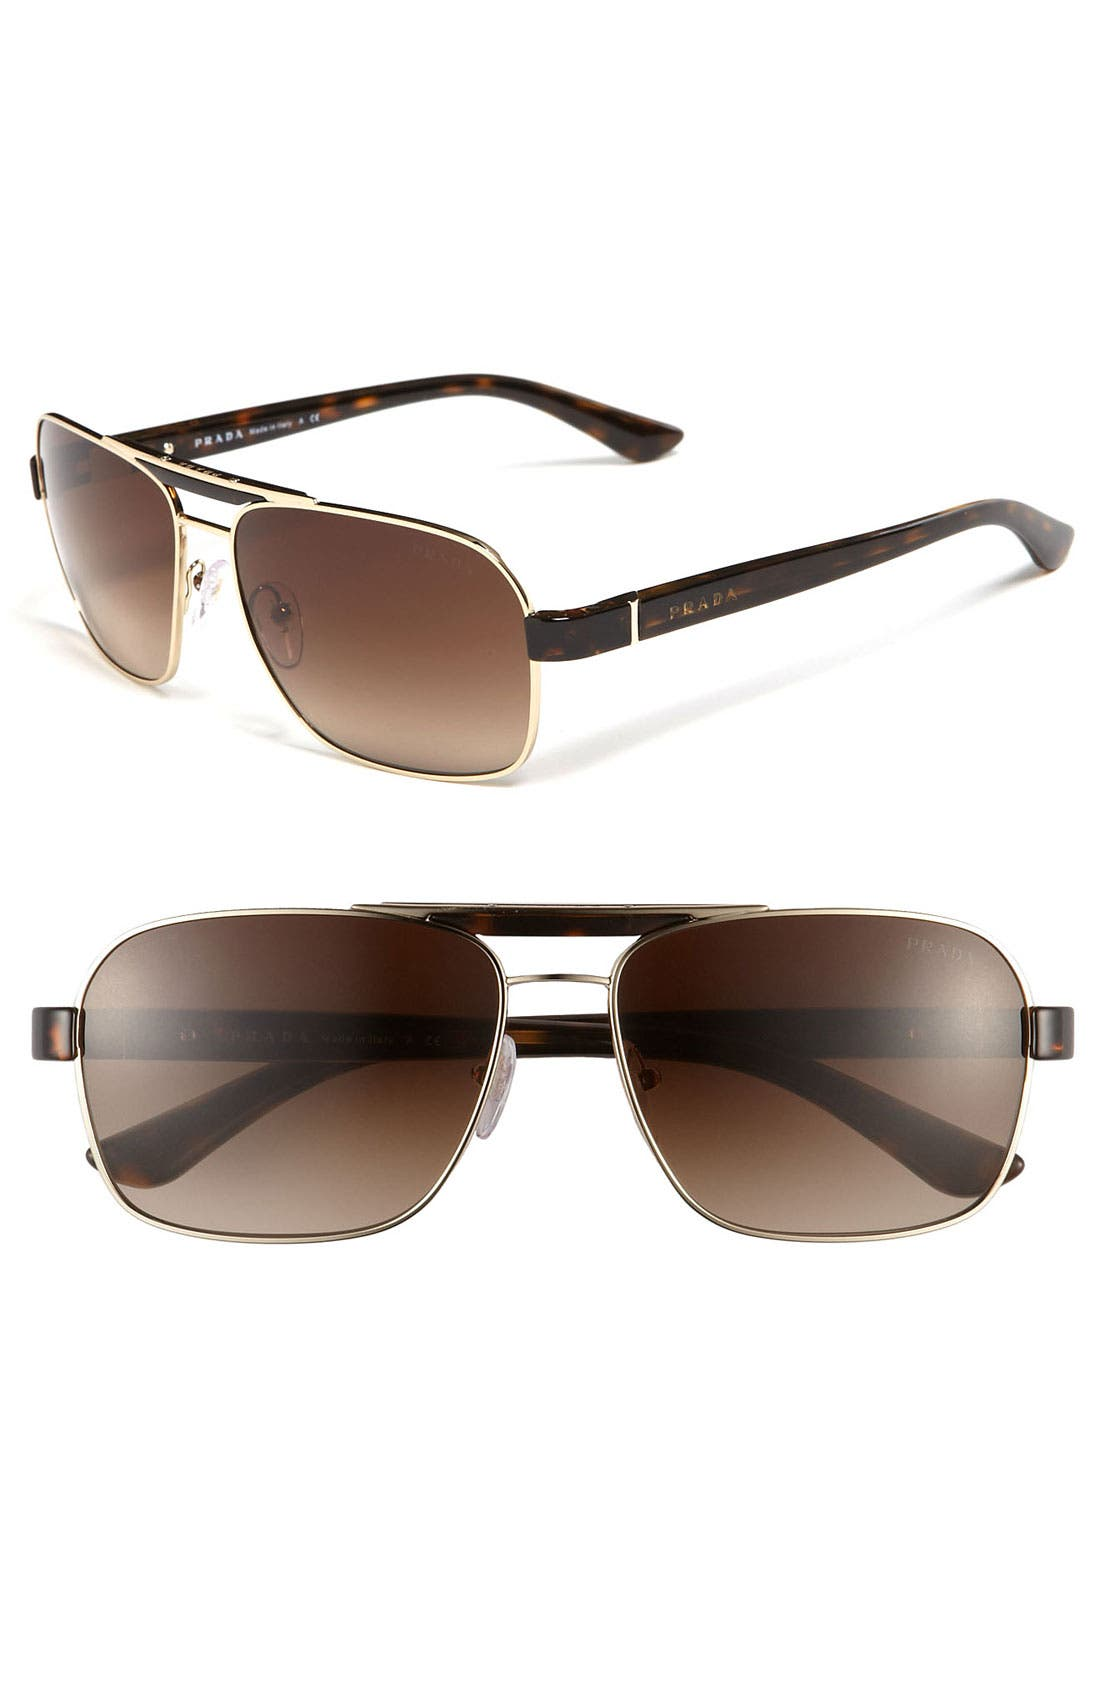 Alternate Image 1 Selected - Prada 60mm Aviator Sunglasses